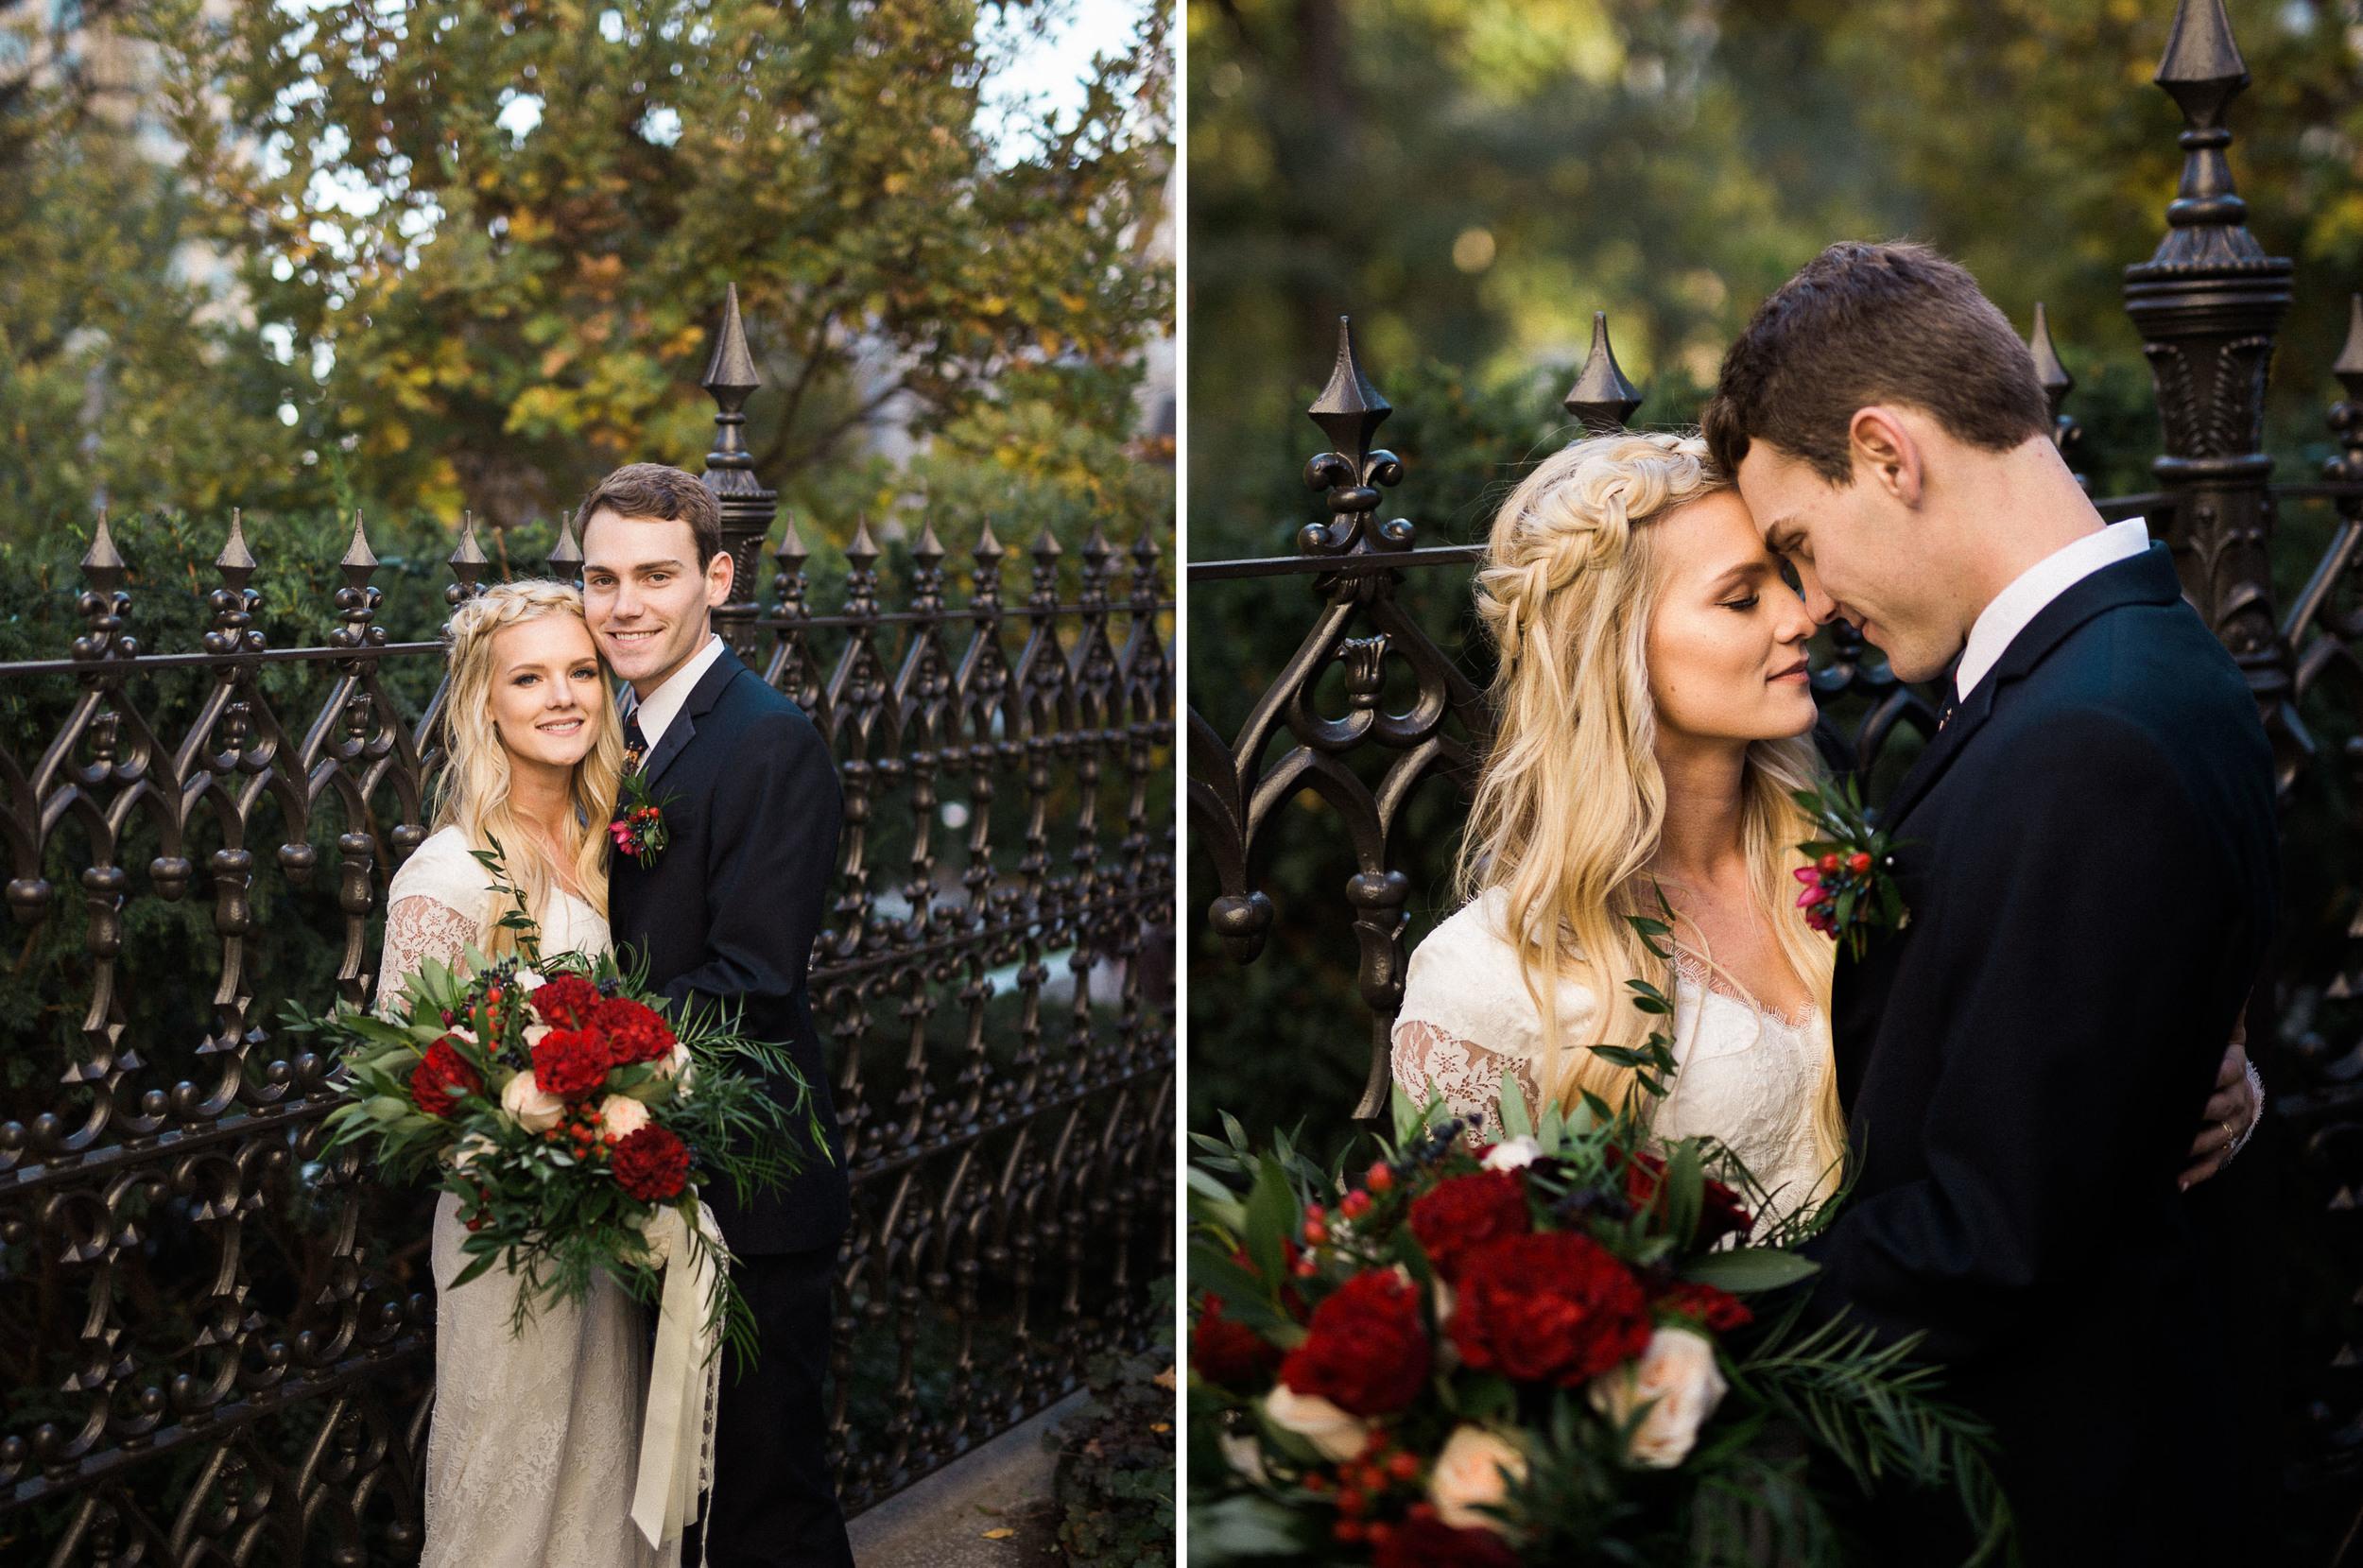 Salt-Lake-City-Temple-Wedding-Photographer-05.jpg